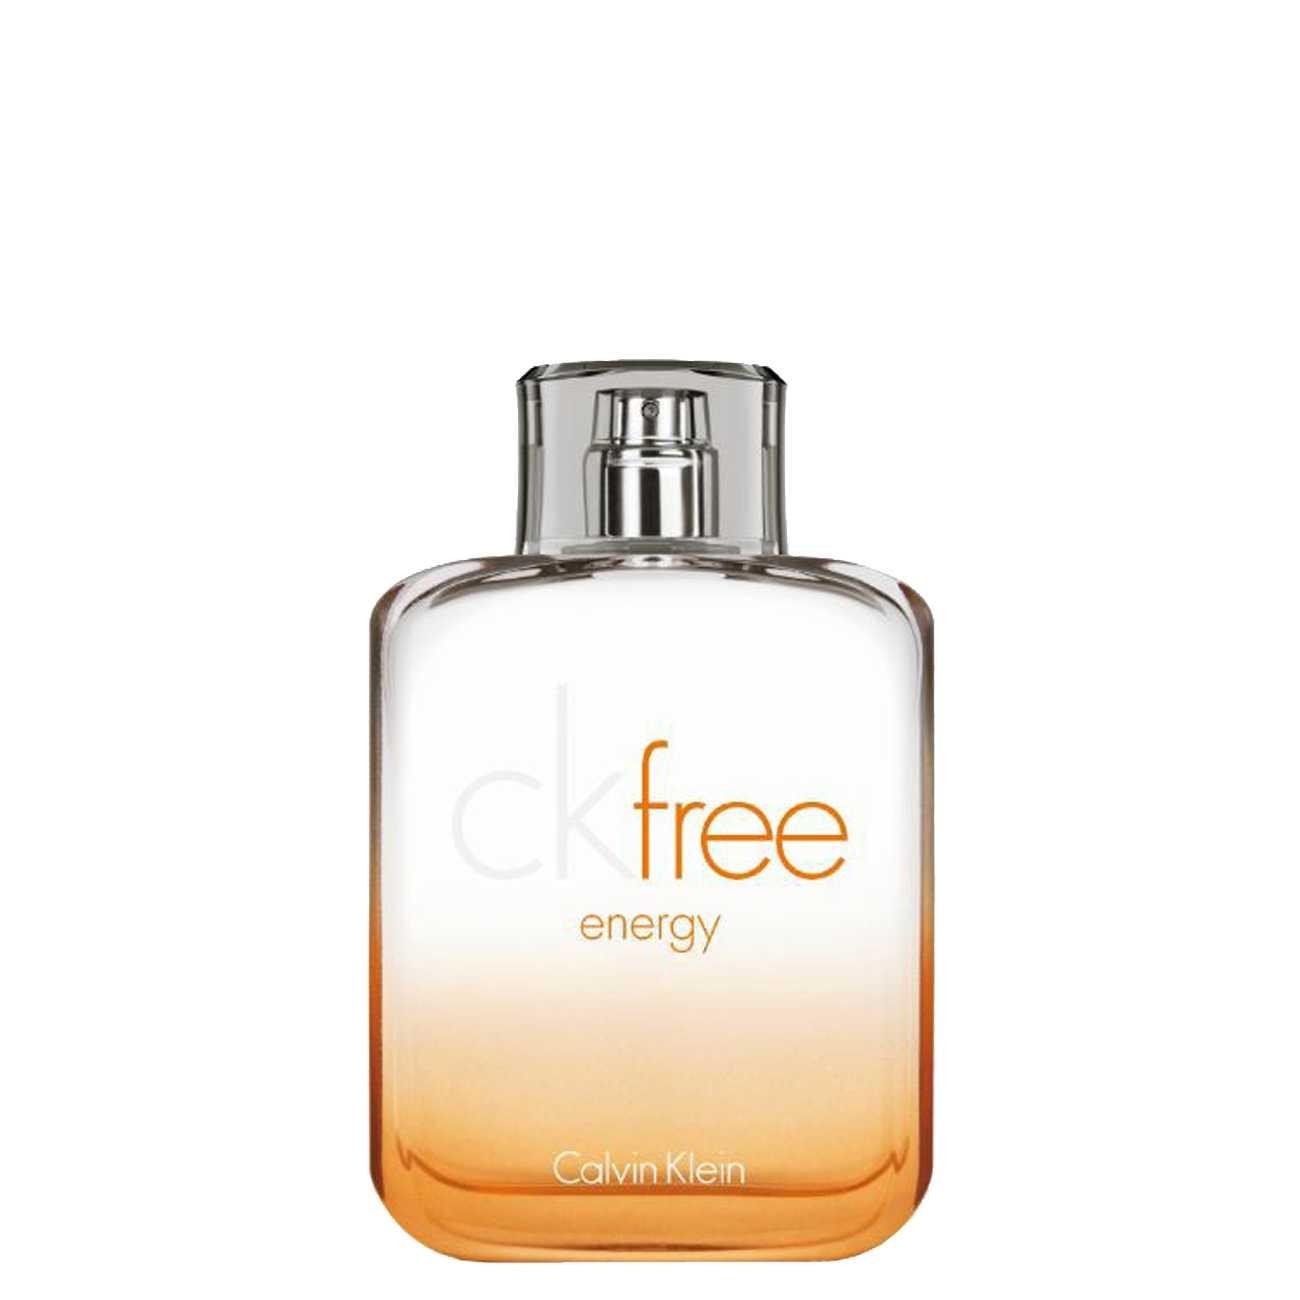 FREE ENERGY 50ml